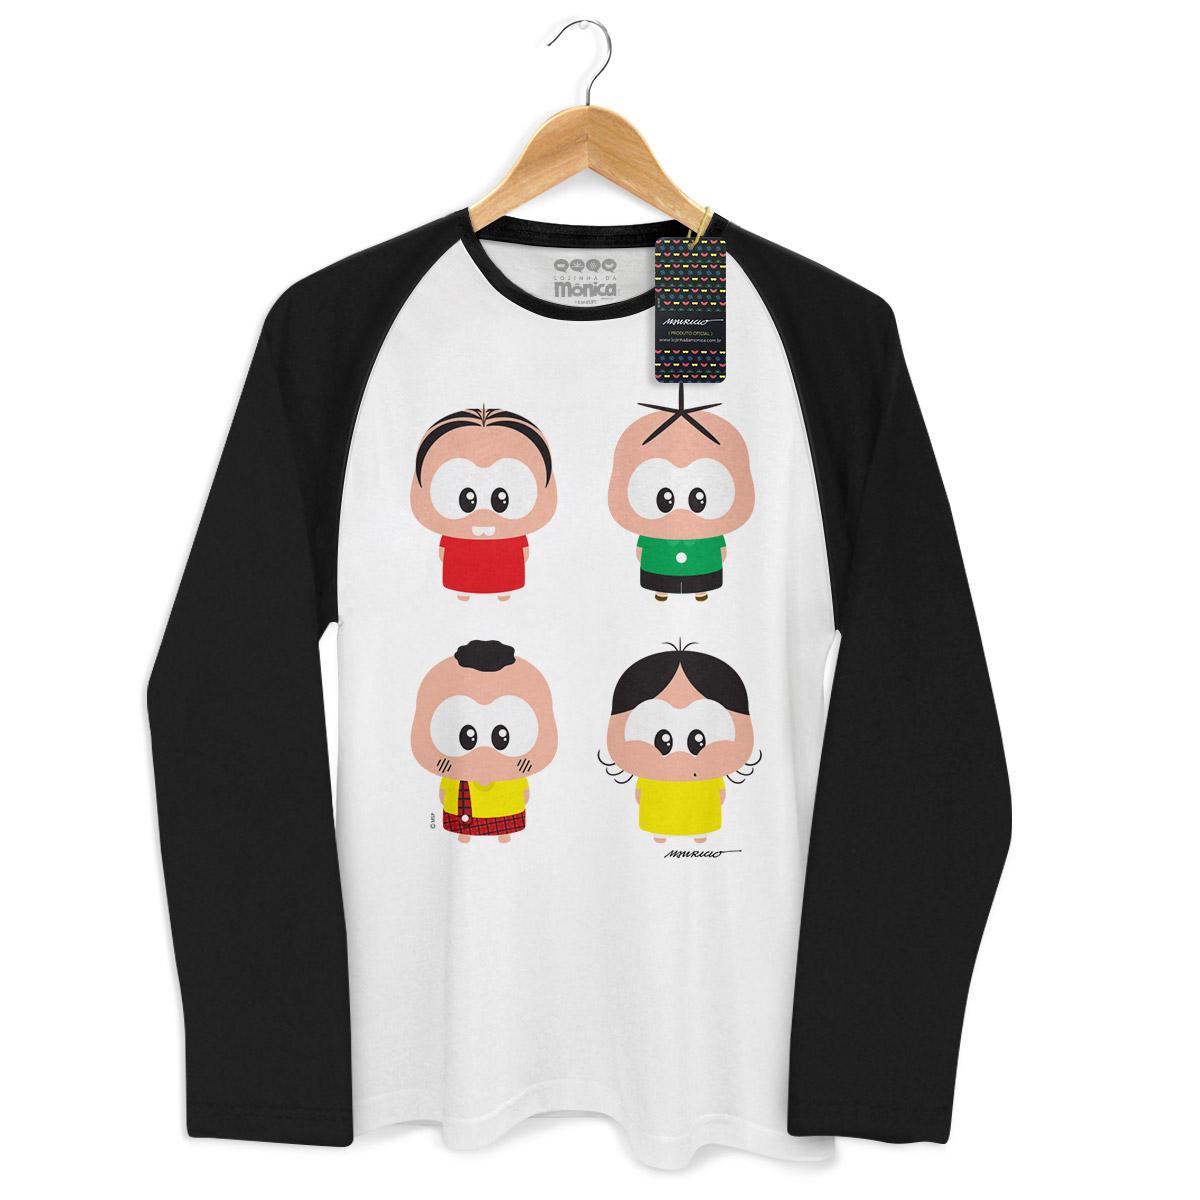 Camiseta Raglan Masculina Turma da M�nica A Turma Toy